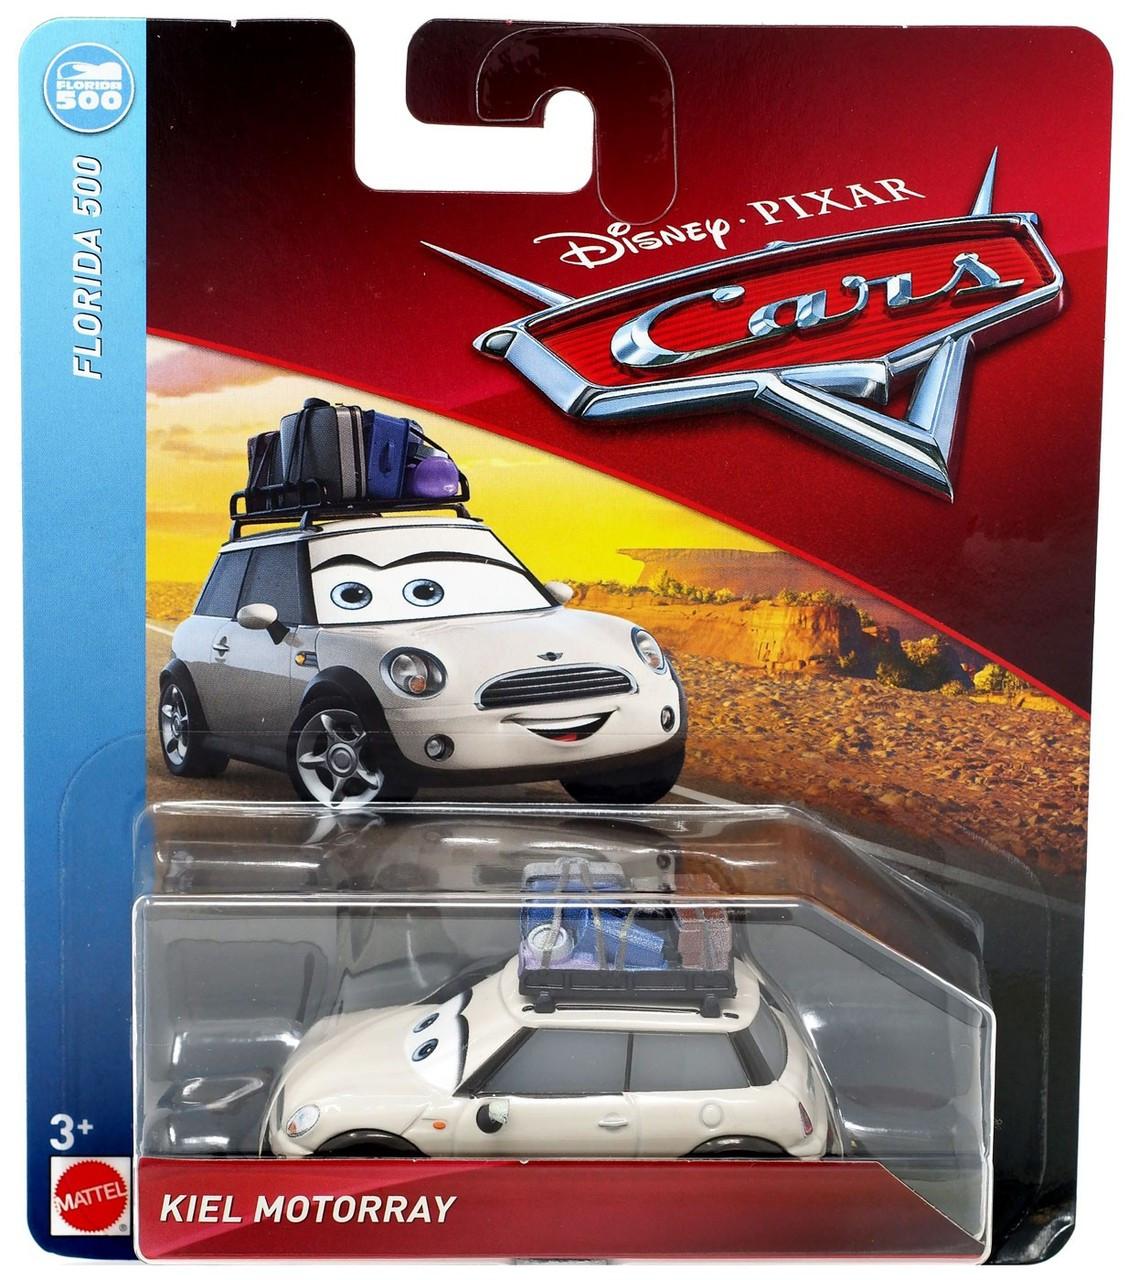 Disney Pixar Cars 3 Kiel Motorray Diecast Mattel Florida 500 2019